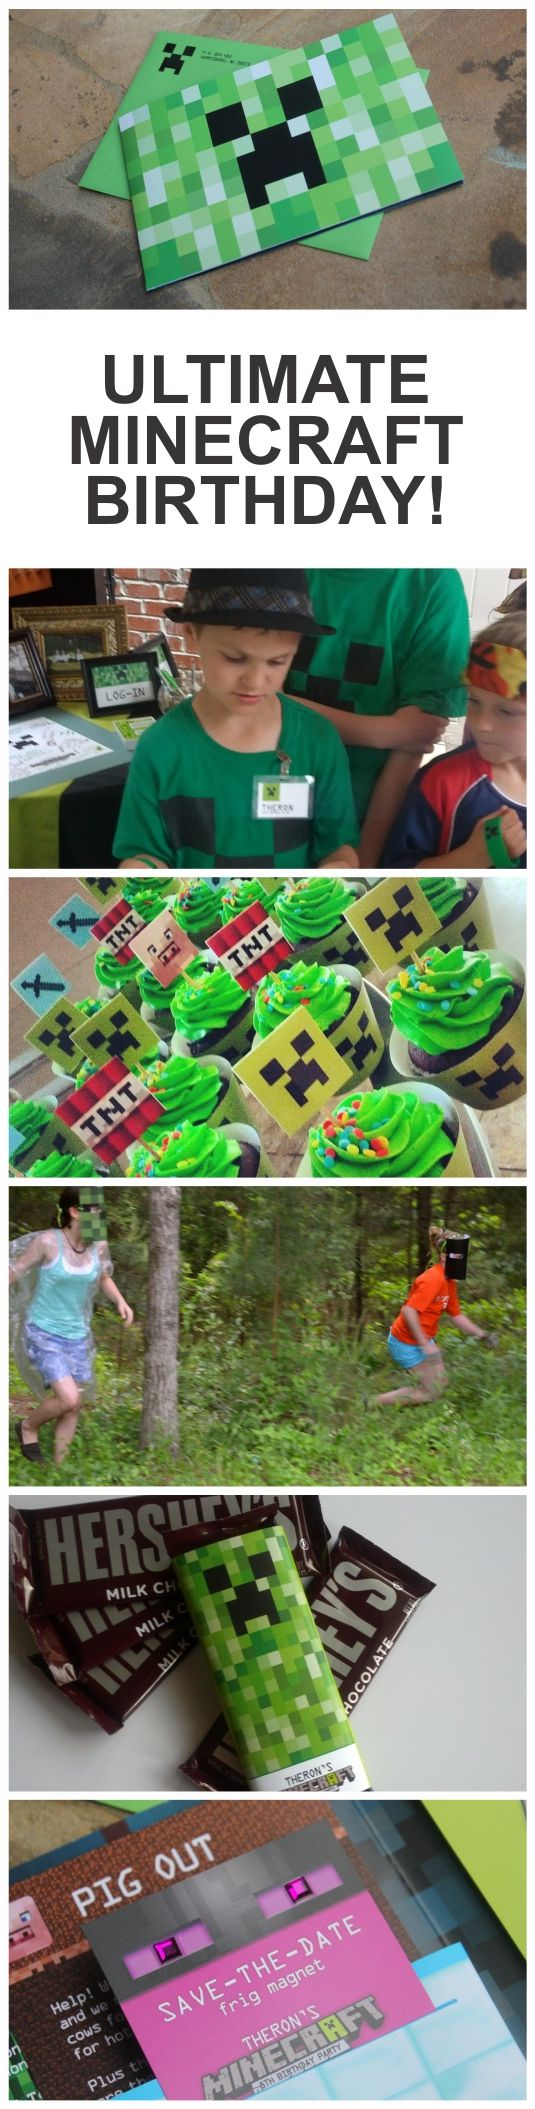 Minecraft birthday party ideas @Mark Van Der Voort Van Der Voort Van Der Voort Susan Coleman for the boys? haha